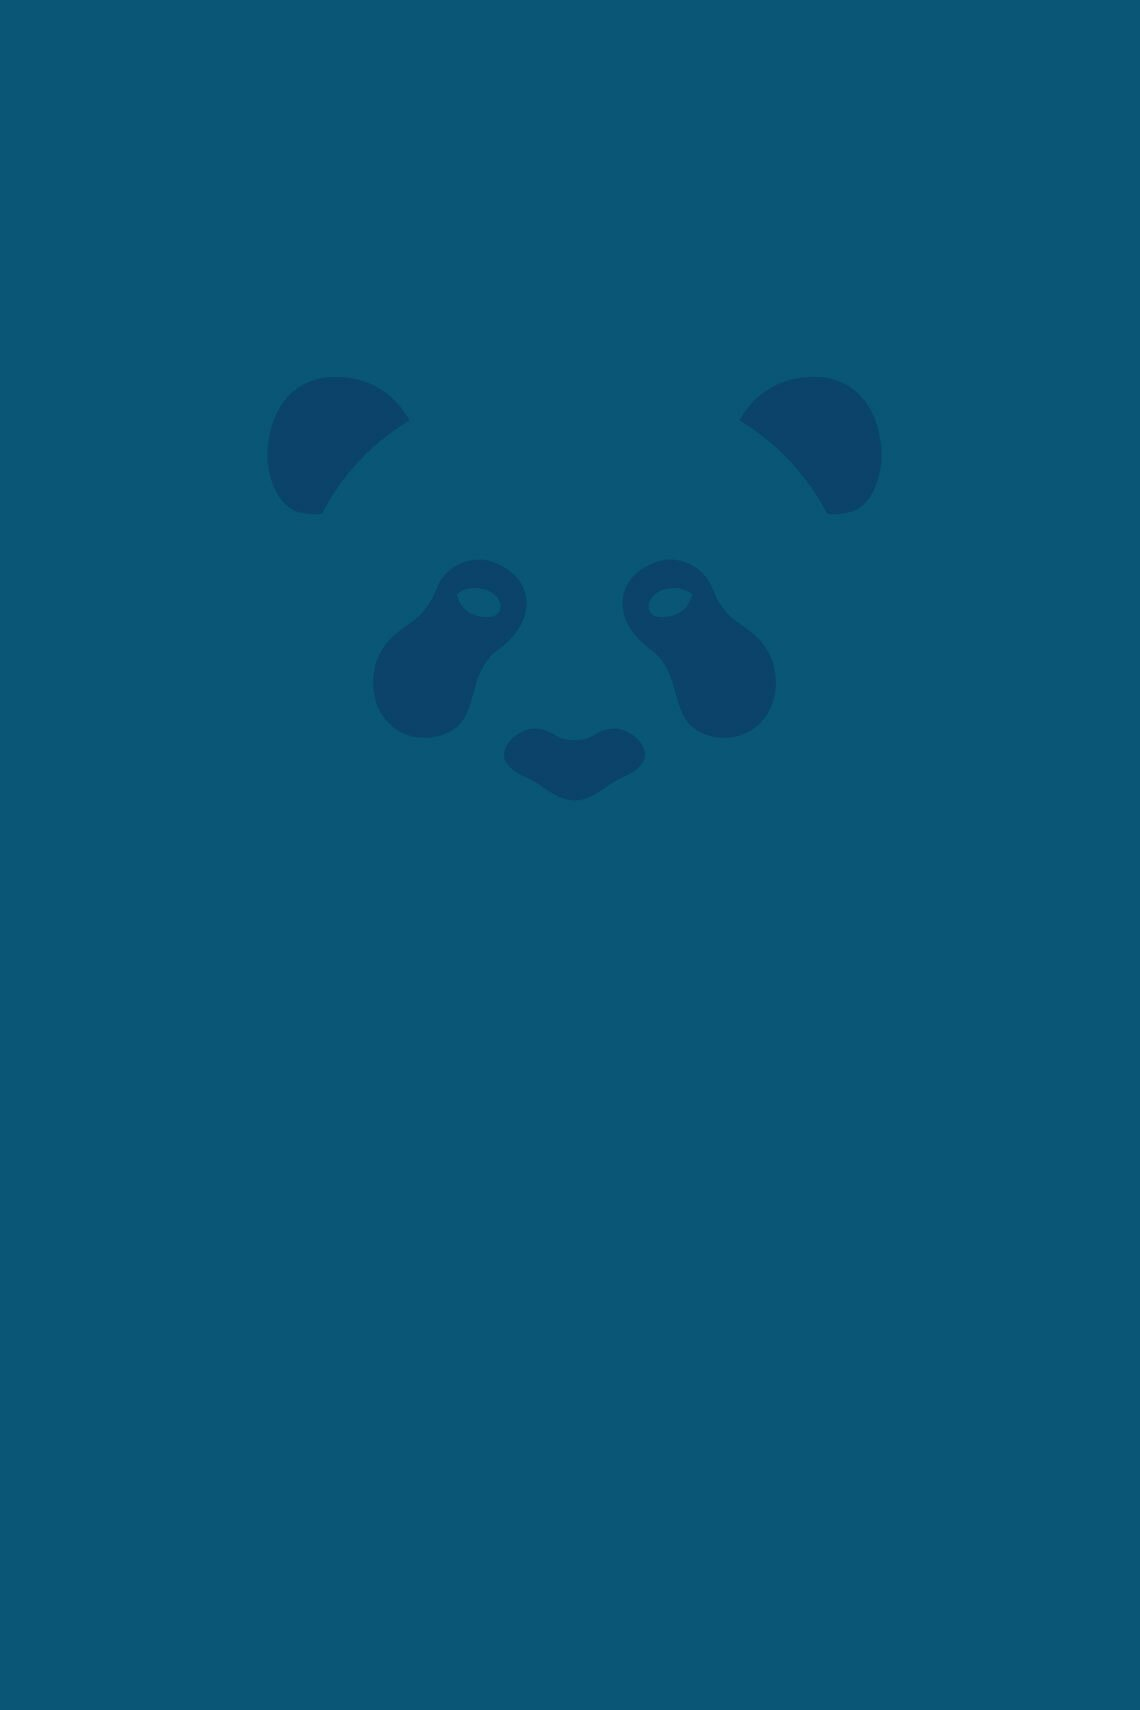 Panda Rose Consulting Studios, Inc.